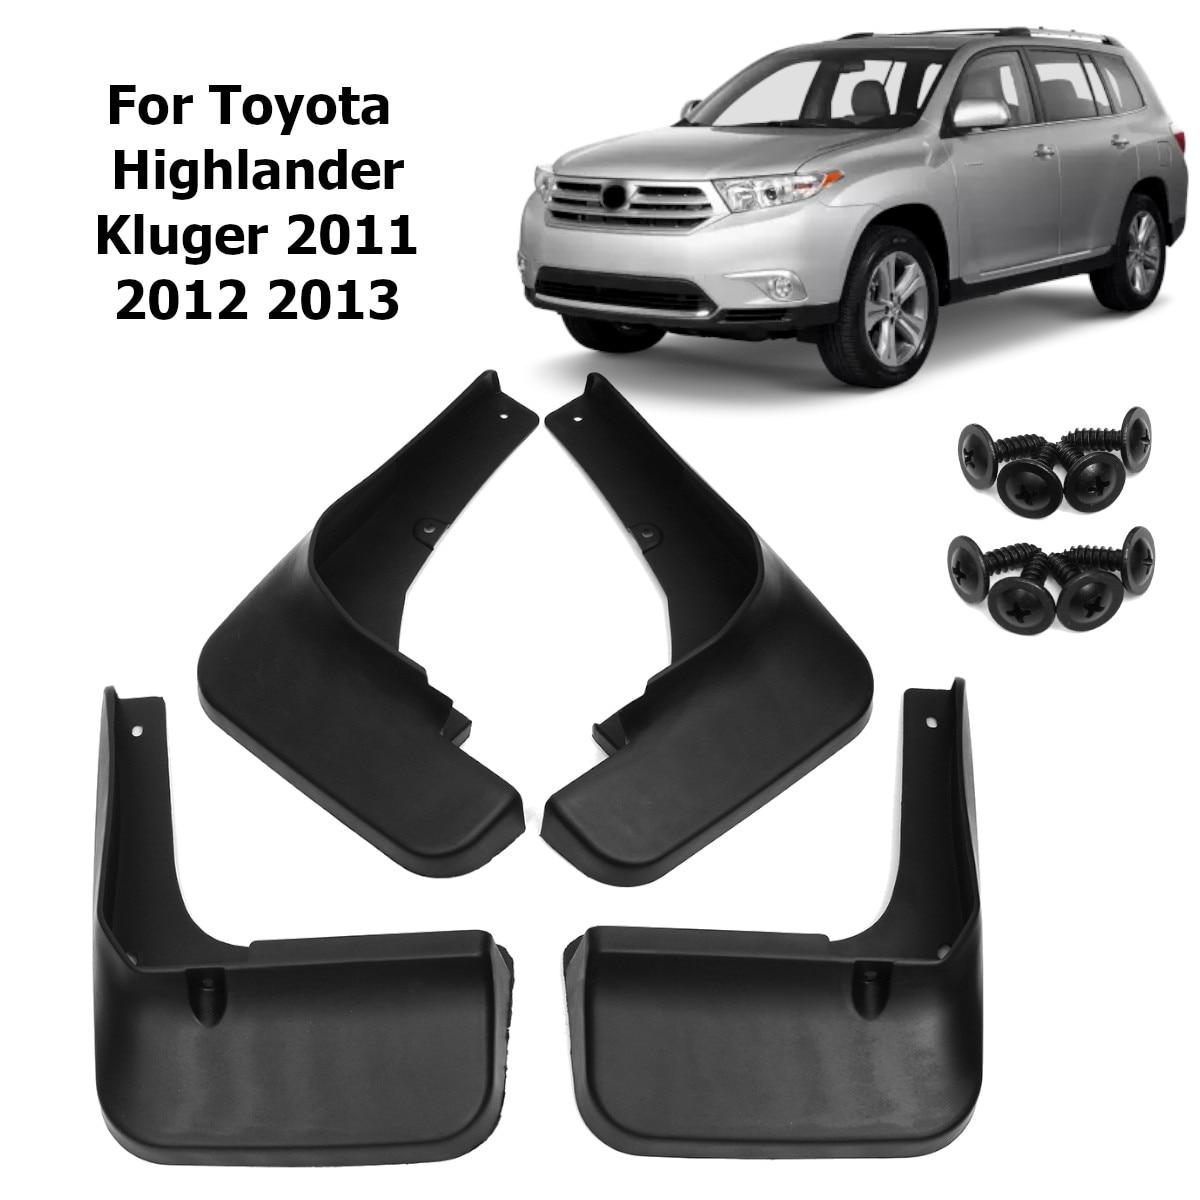 Guardabarros de coche guardabarros accesorios para Toyota Highlander XU40 2011 2012 2013